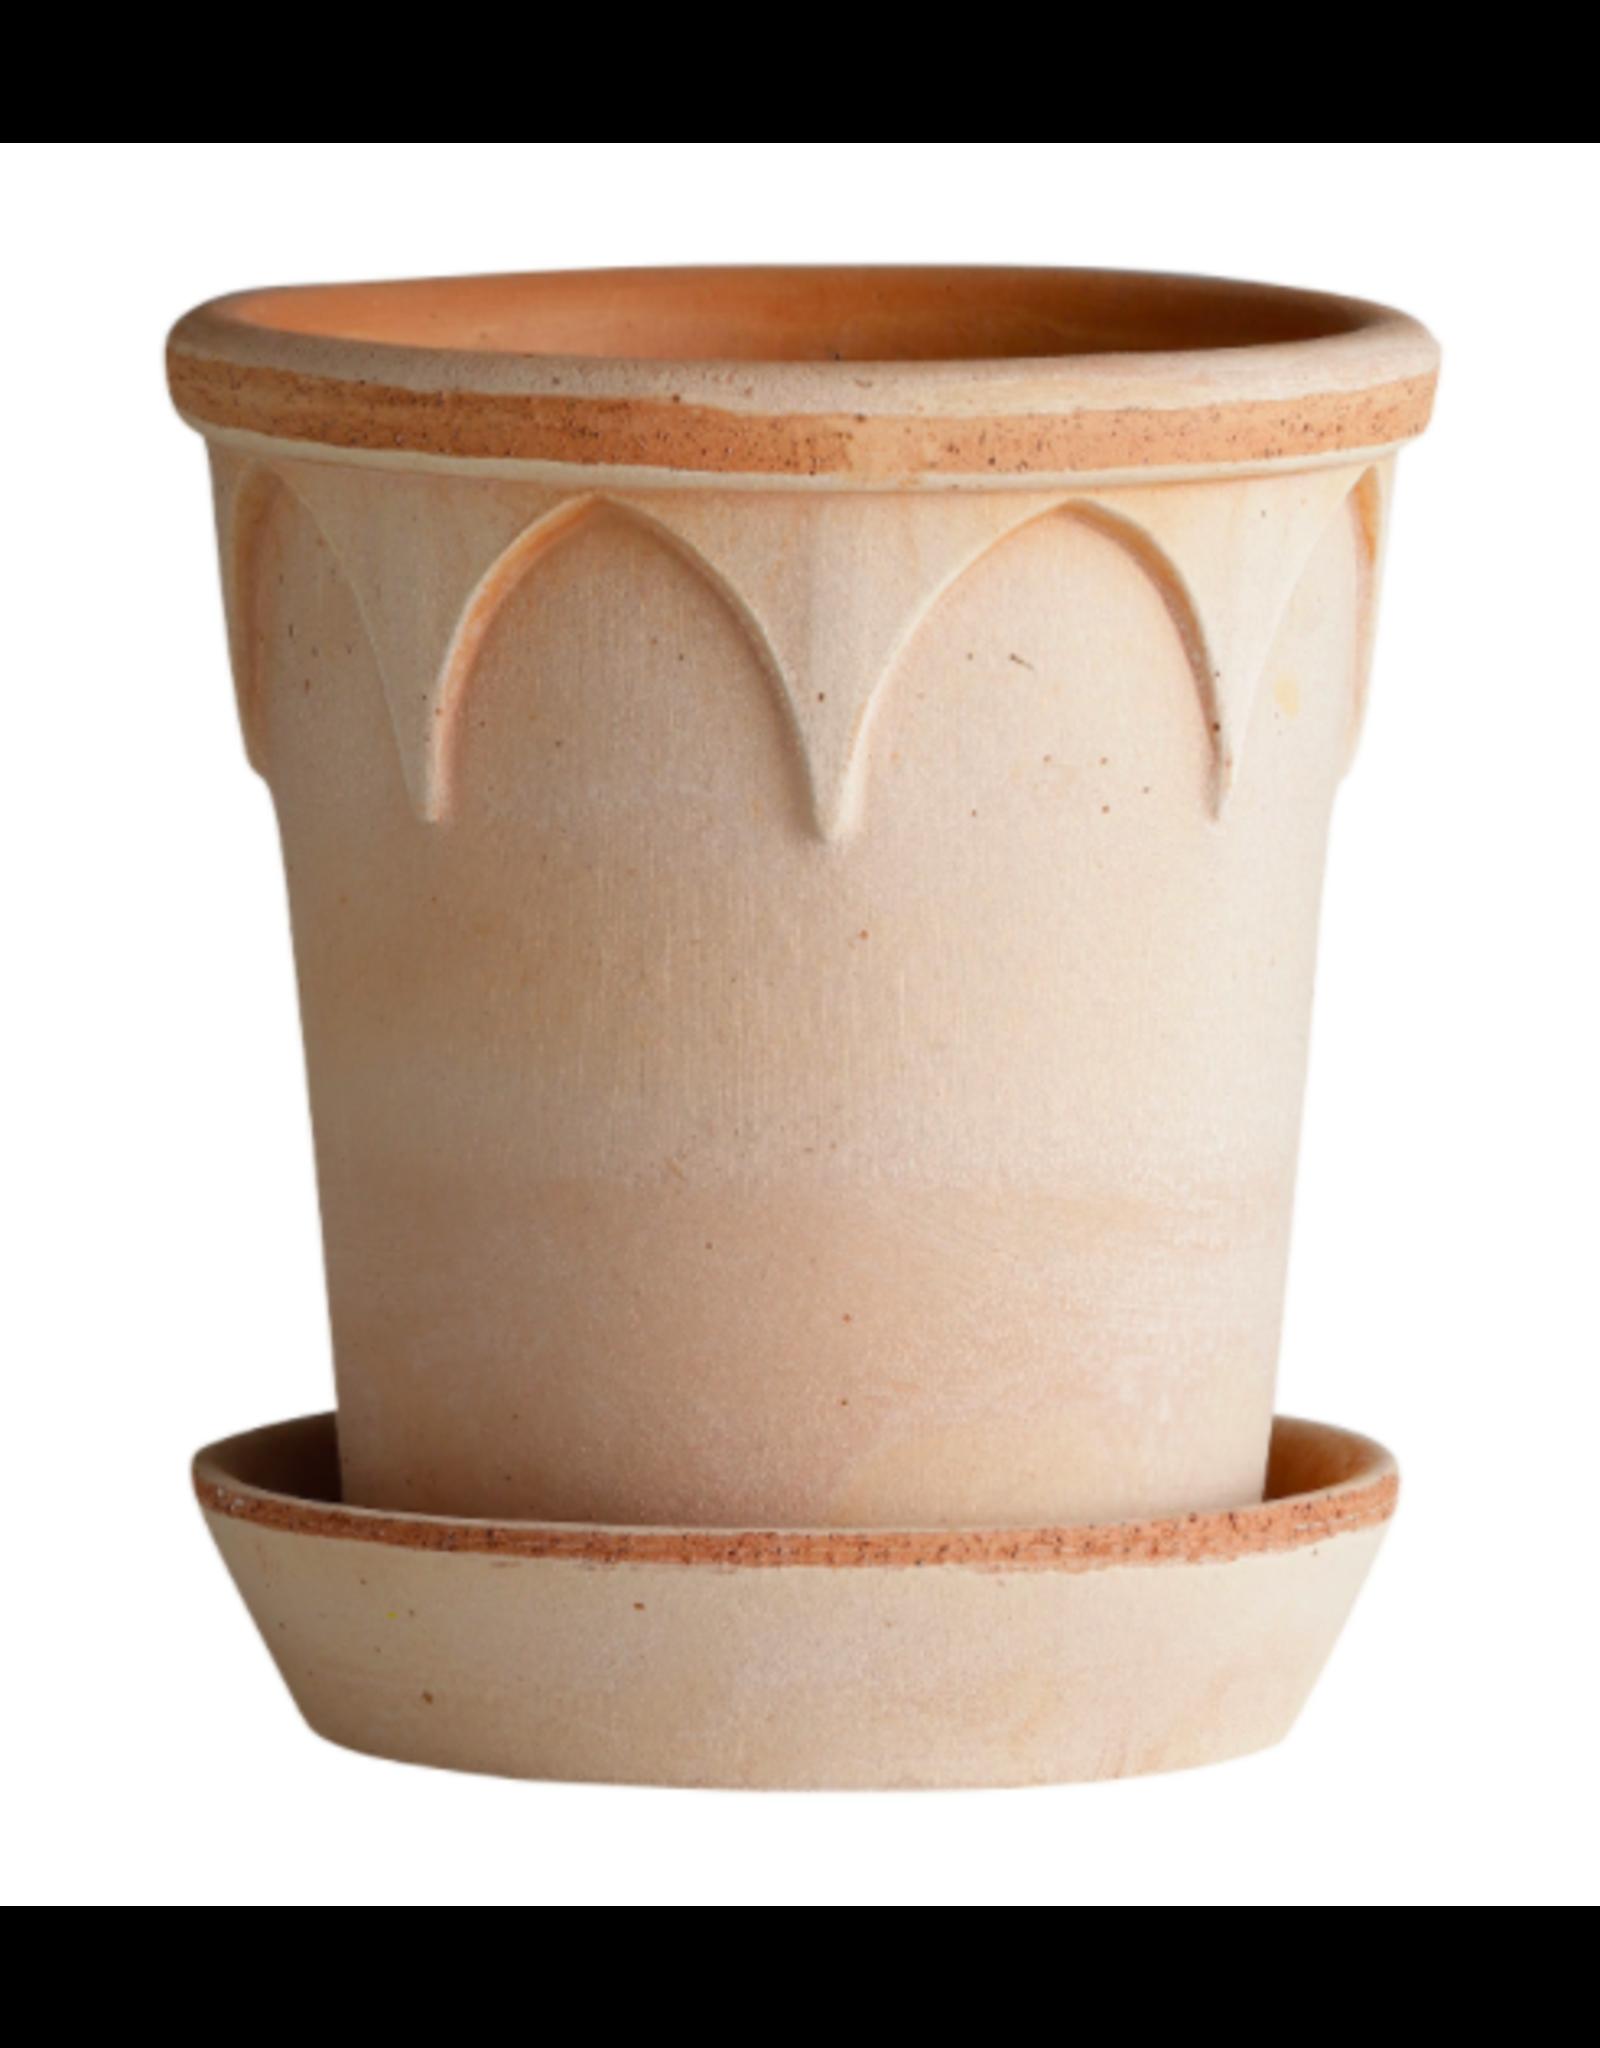 Bergs Potter Elizabeth Pot in Rose + Saucer by Bergs Potter